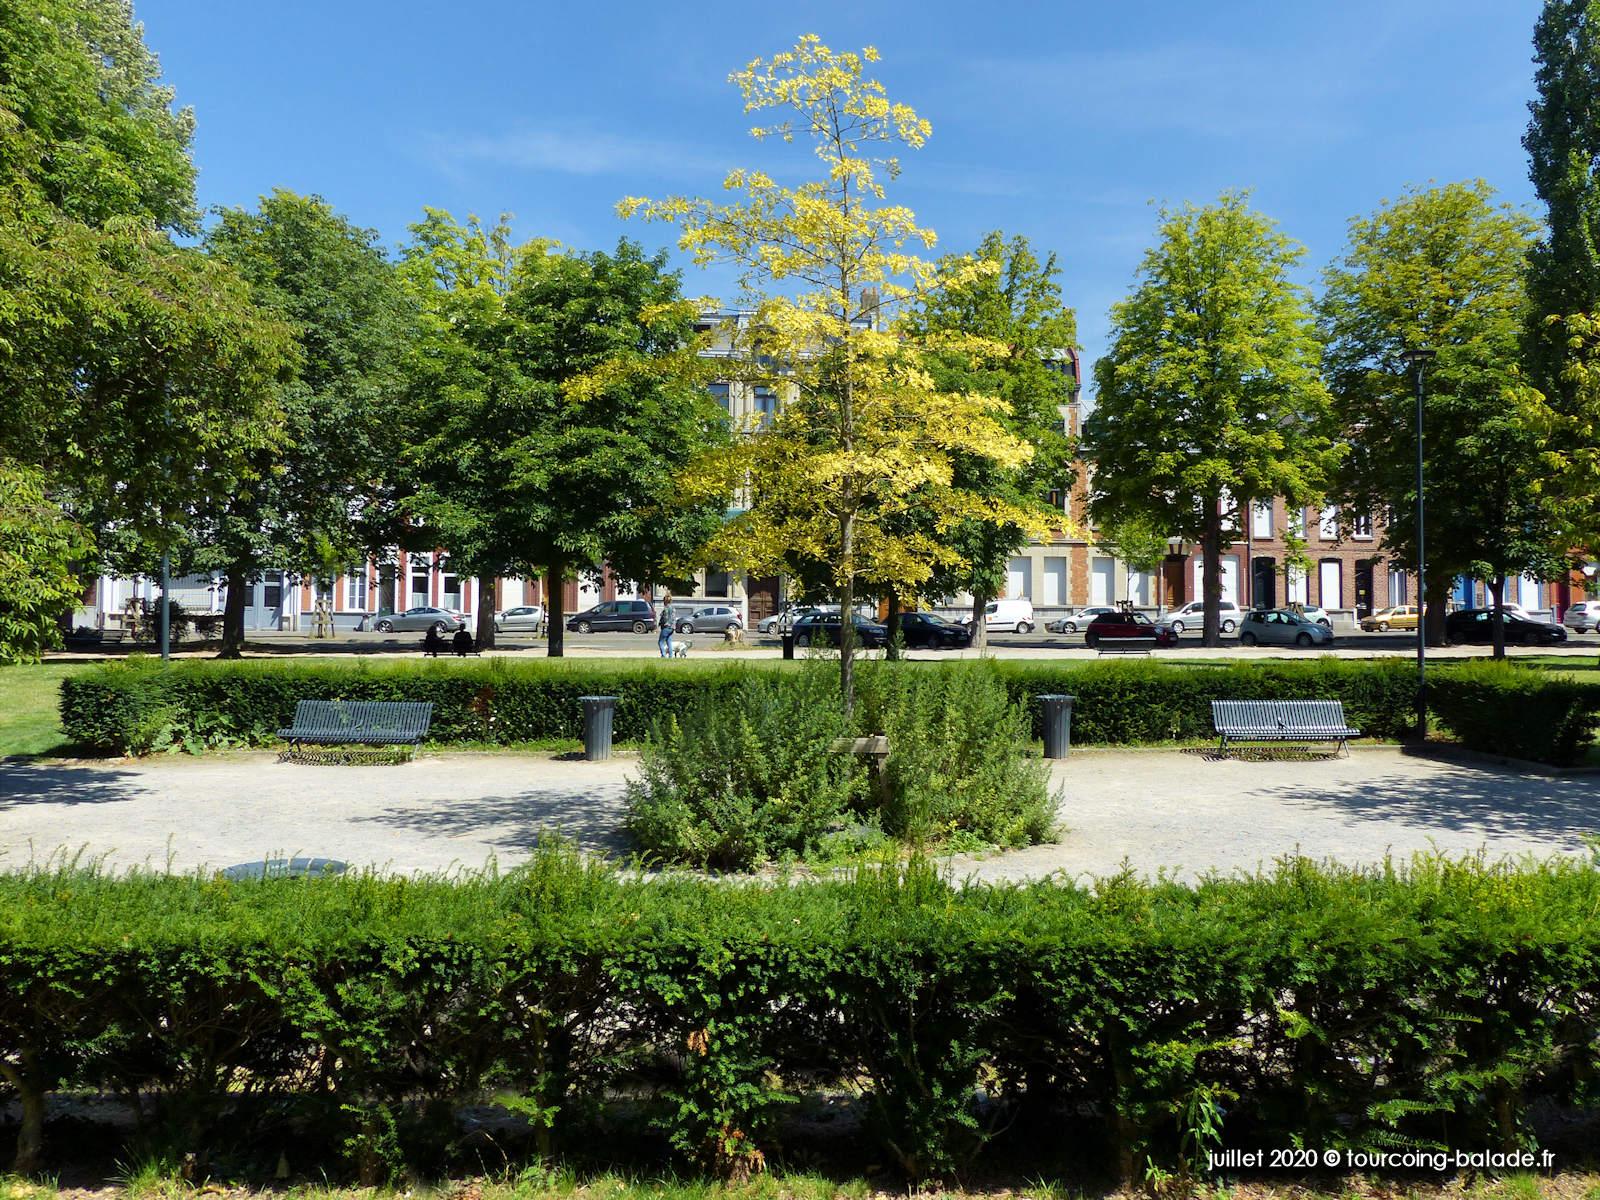 Arbre de la Liberté, Tourcoing 2020